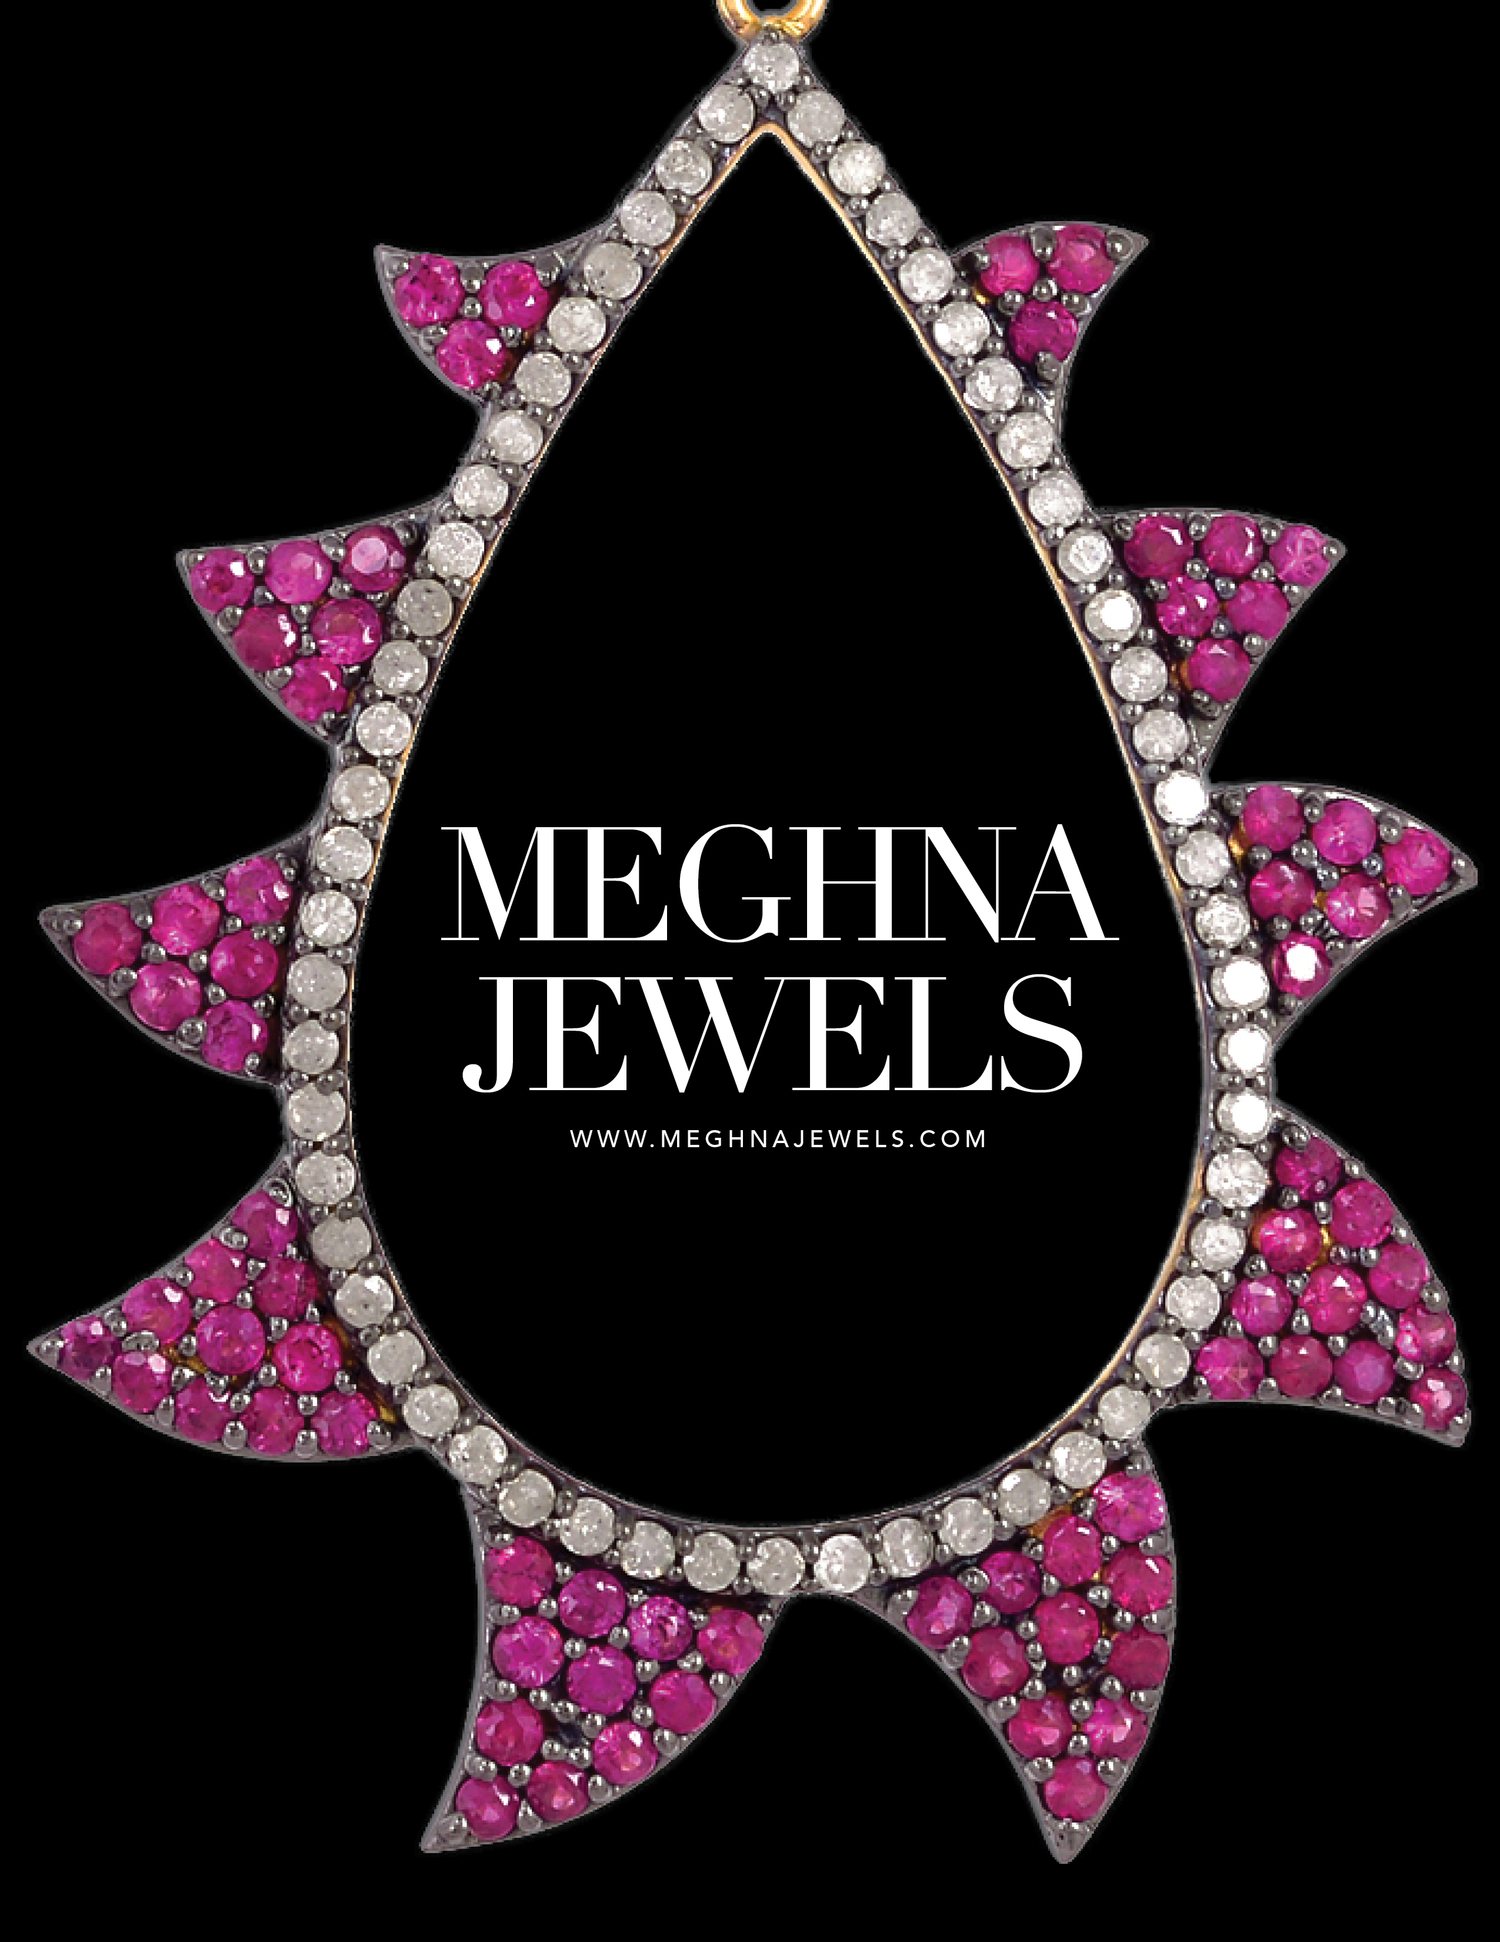 Luxury Designer Jewelry | Meghnajewels.com